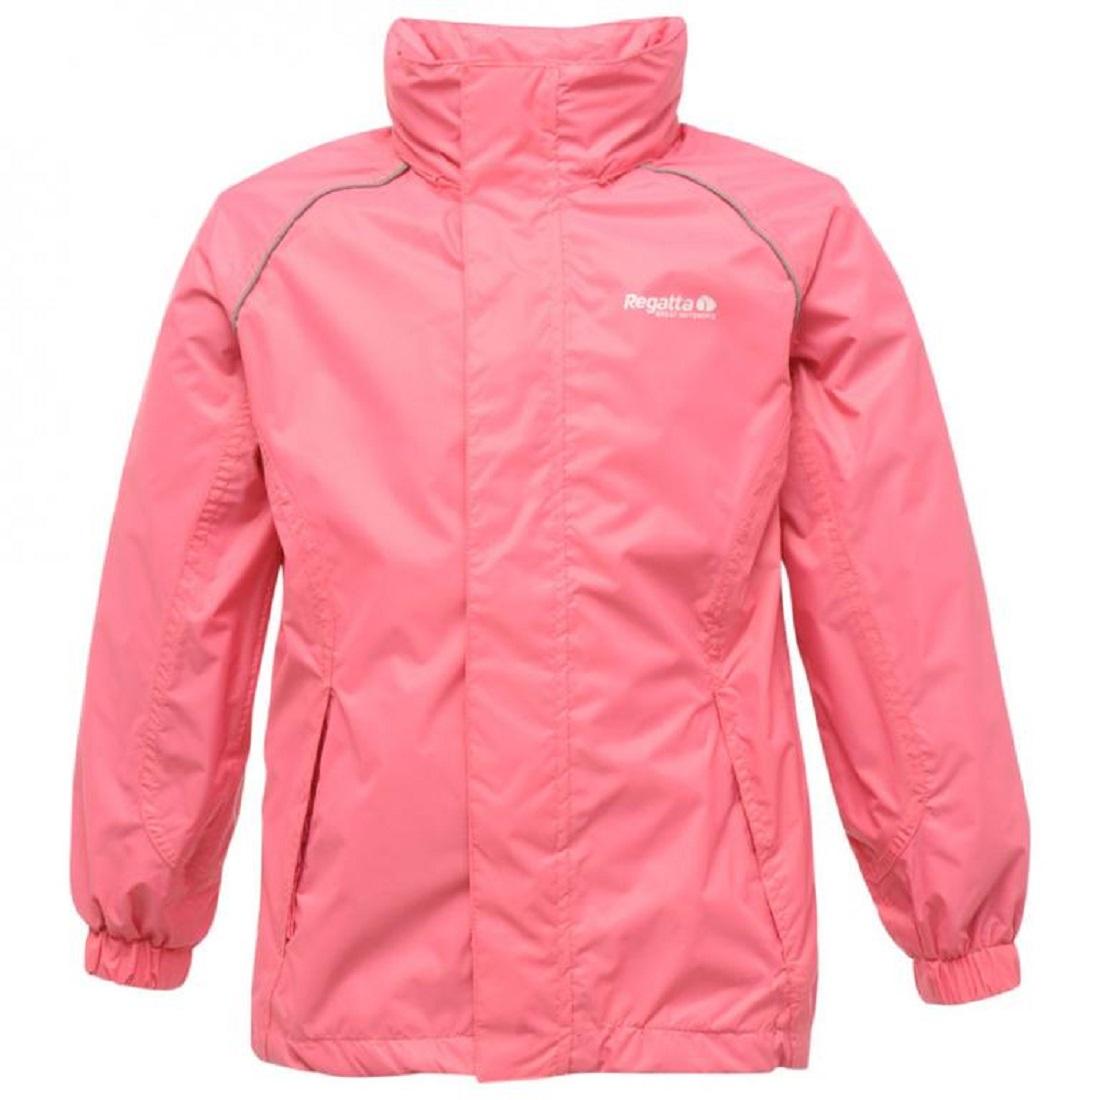 Lightweight Waterproof Breathable Jacket Jacket To